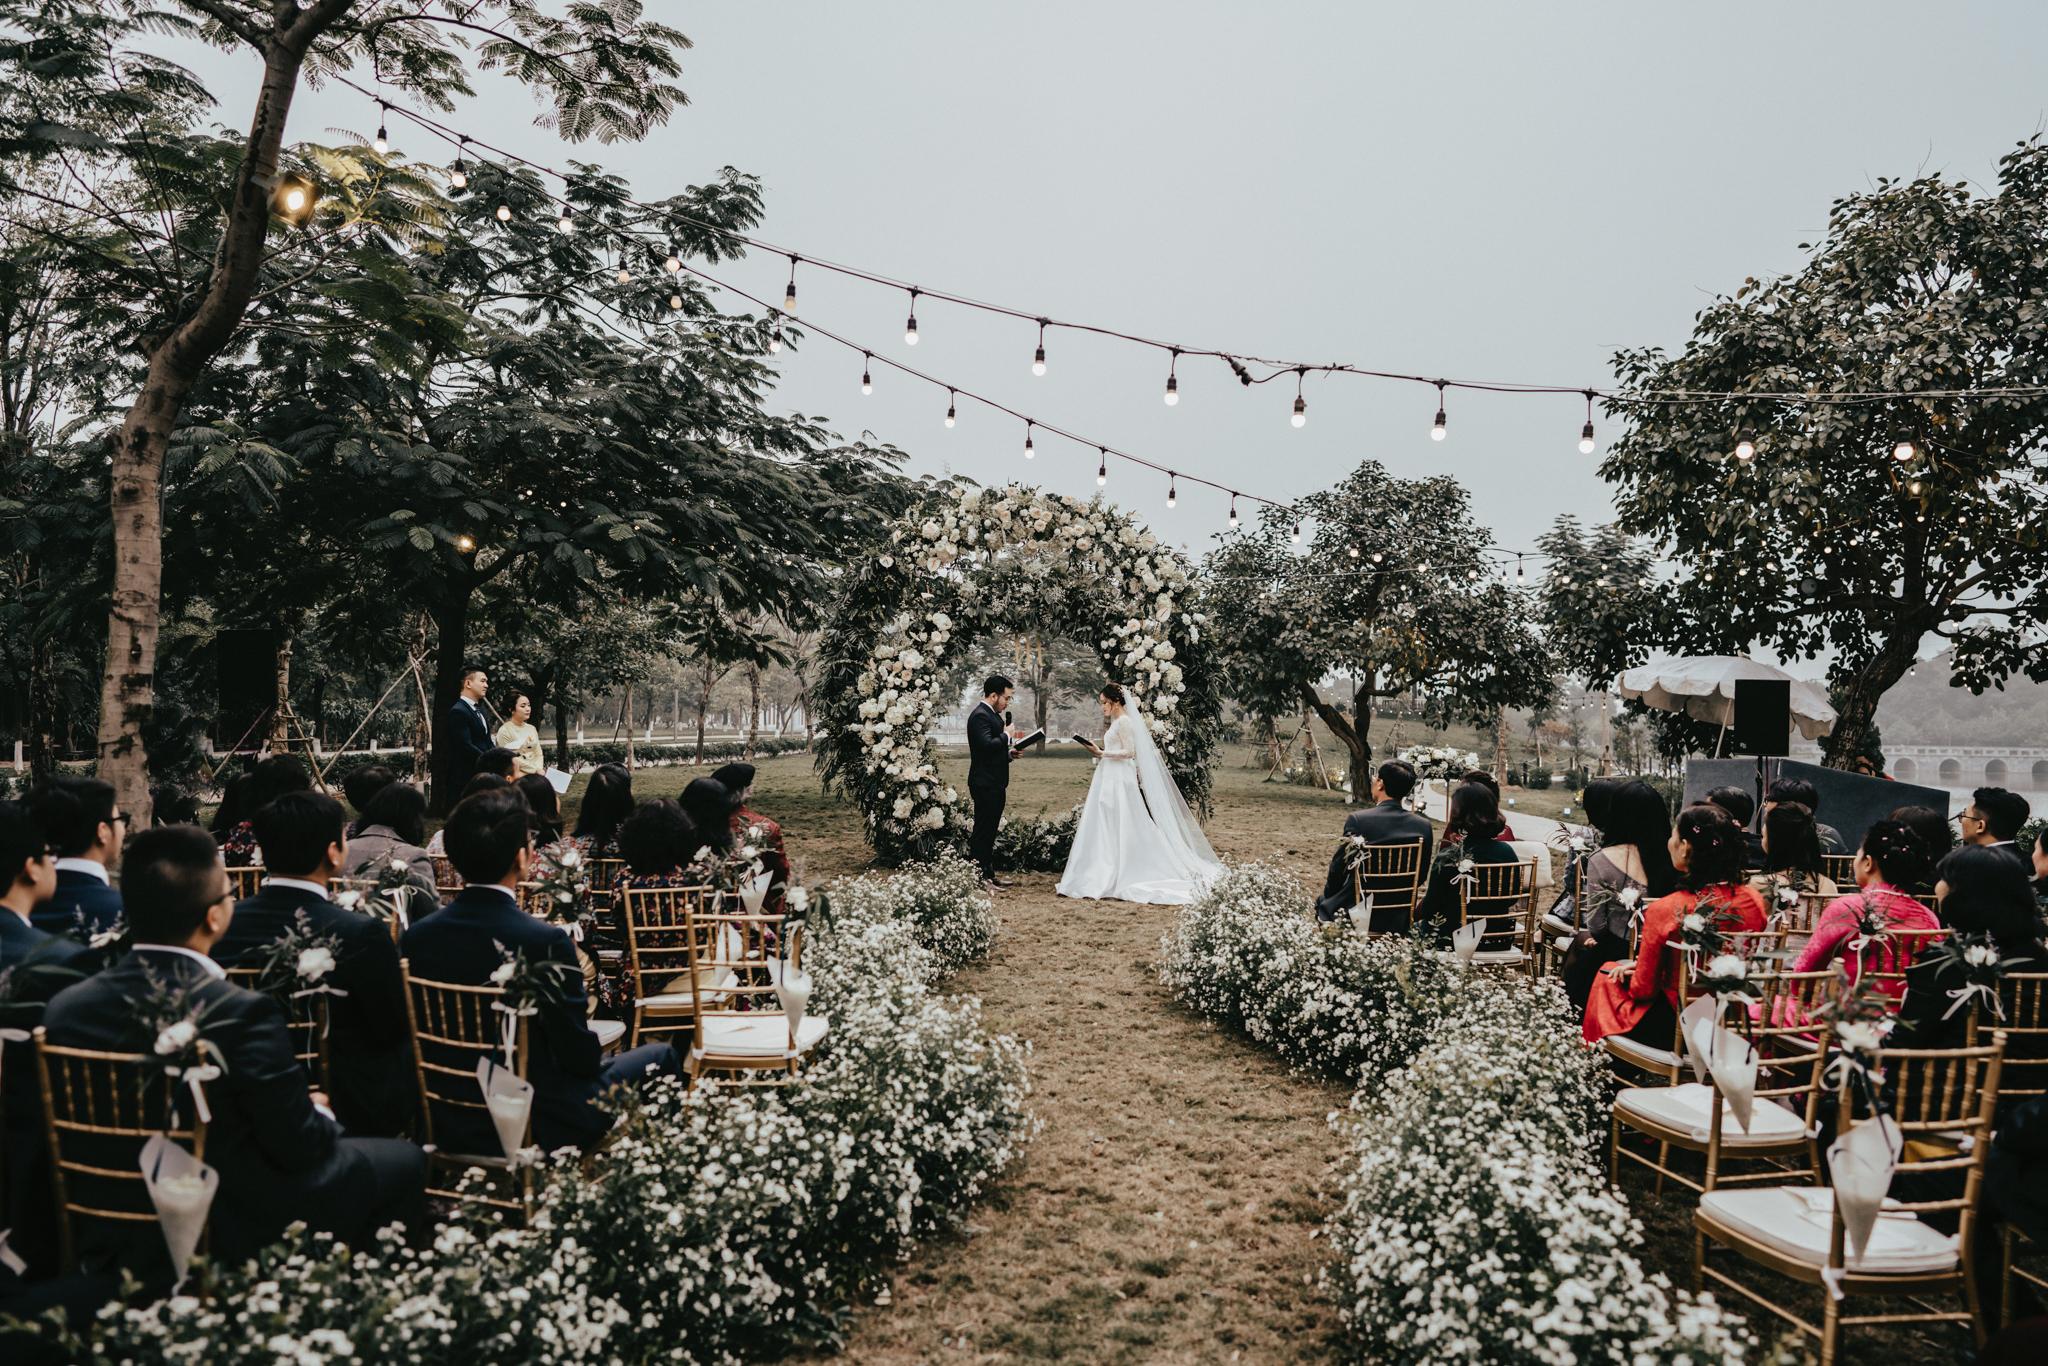 JWMarriott Ha Noi Intimate Wedding of Trang Hi well captured by Hipster Wedding Vietnam Wedding Photographer-35871.jpg